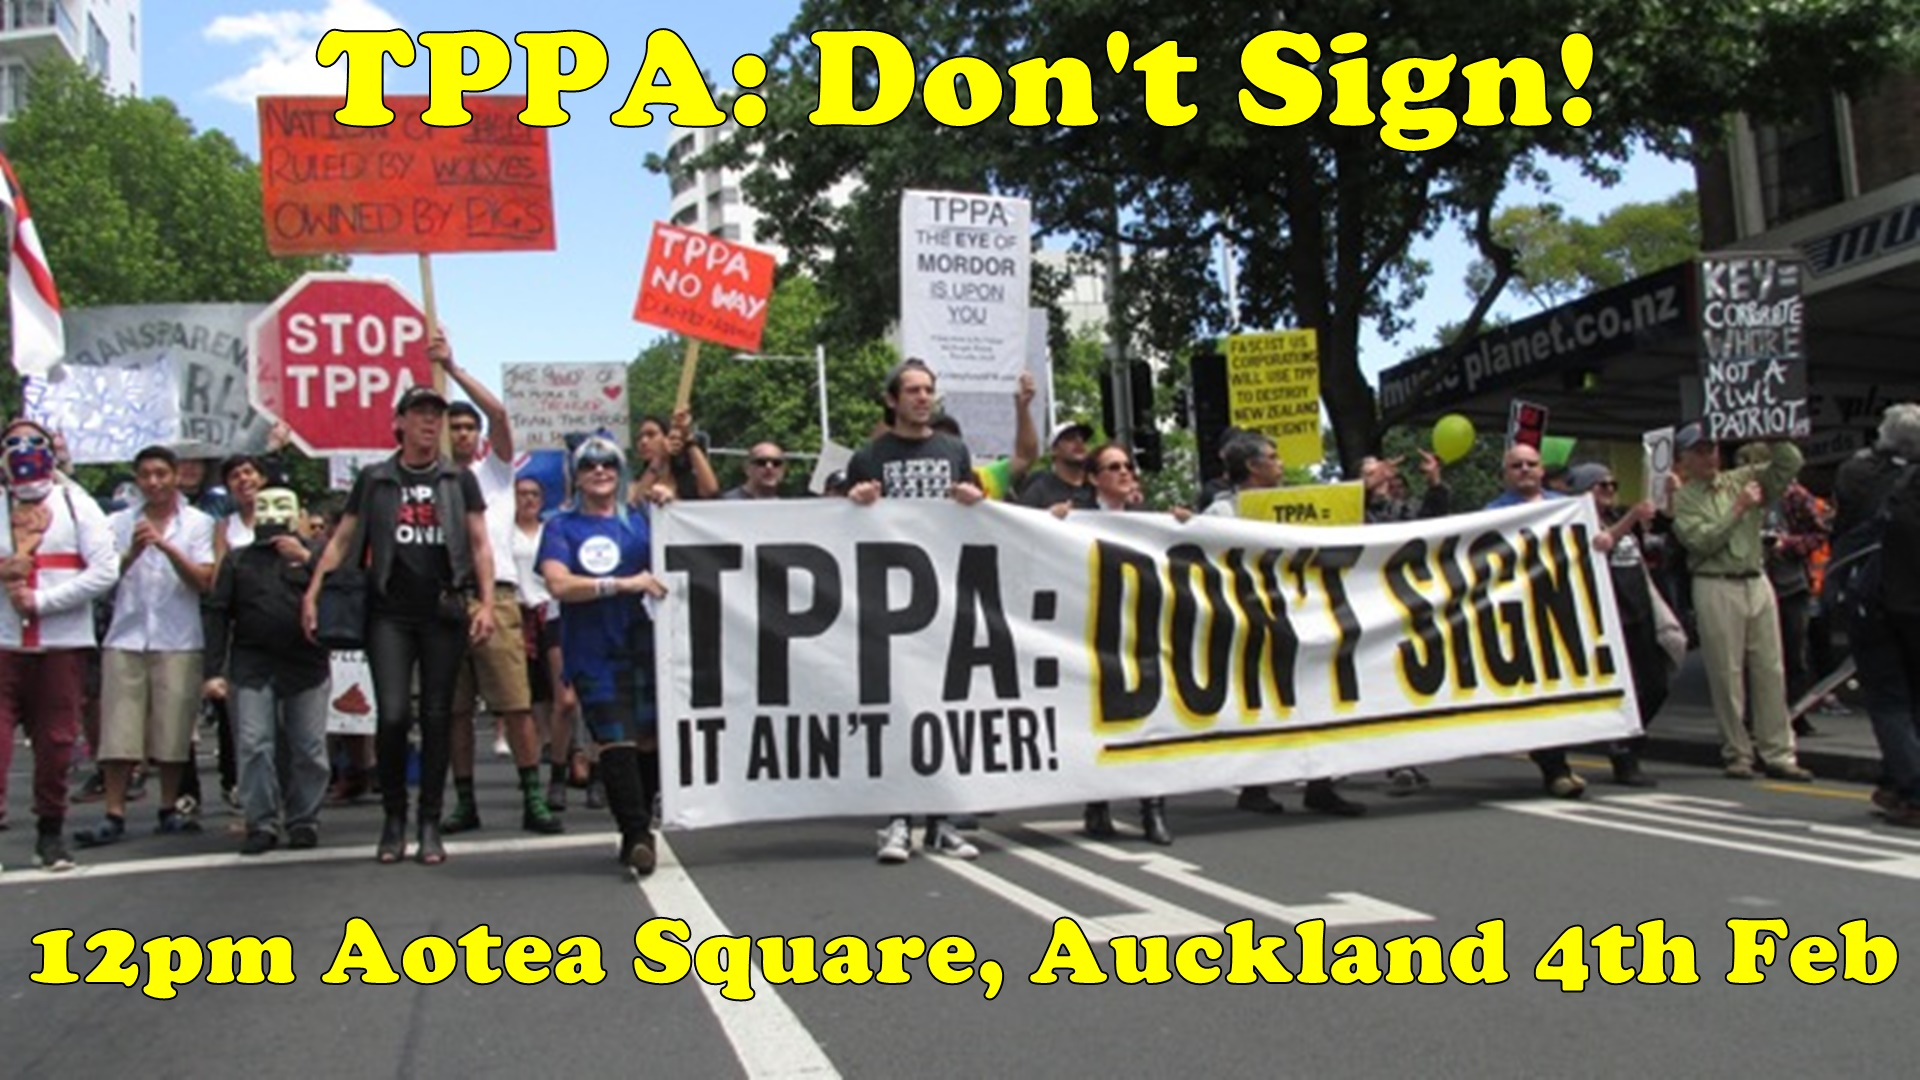 TPPA Dont Sign lrg